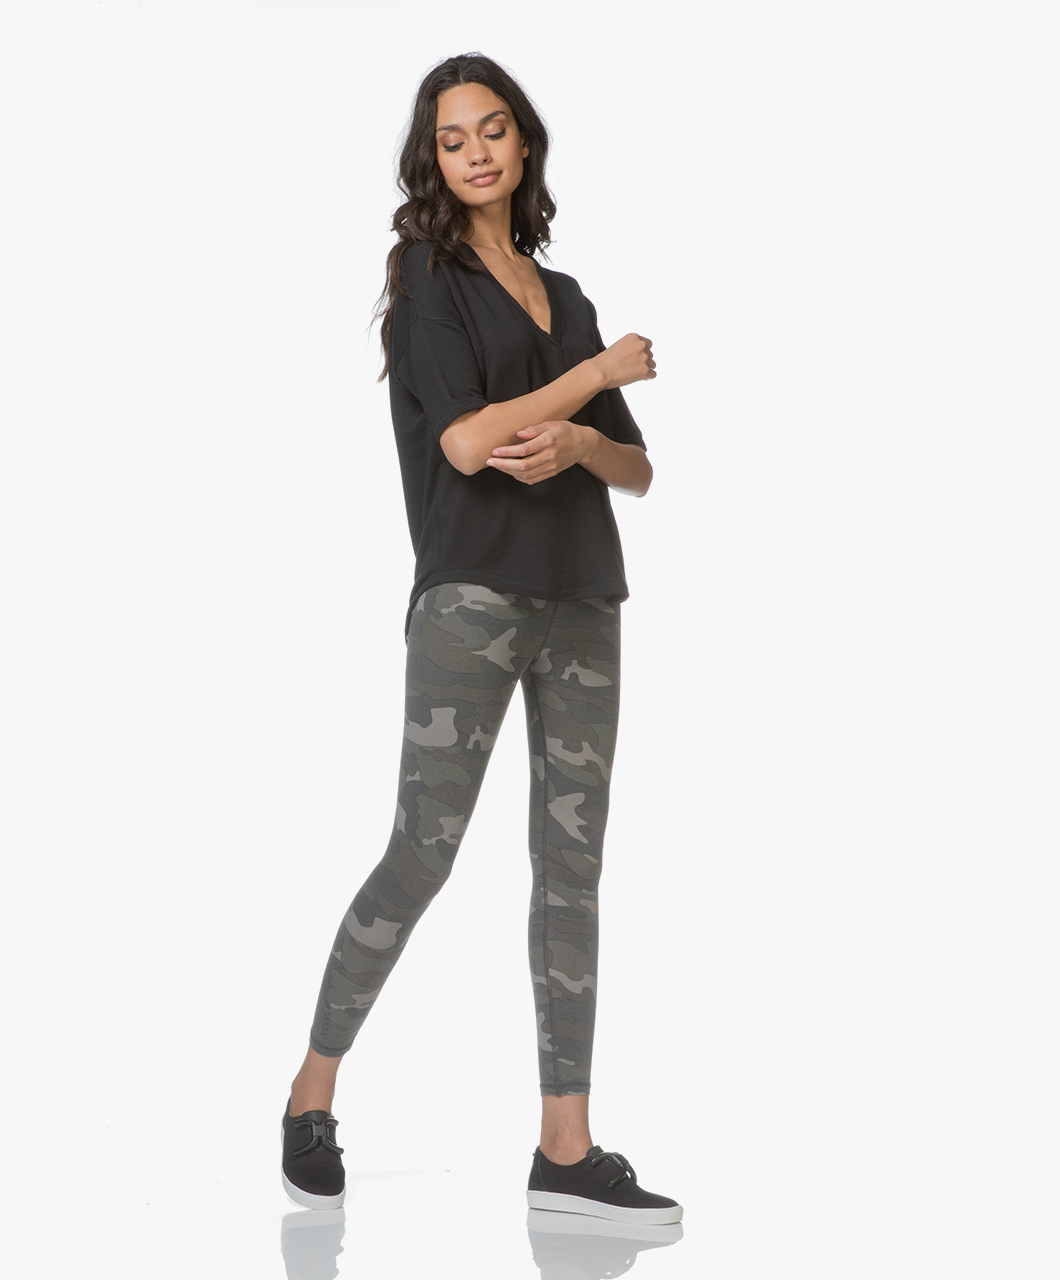 042ce38c4cb12 Ragdoll LA Camo Printed Leggings - Army - camo leggings | s102cm